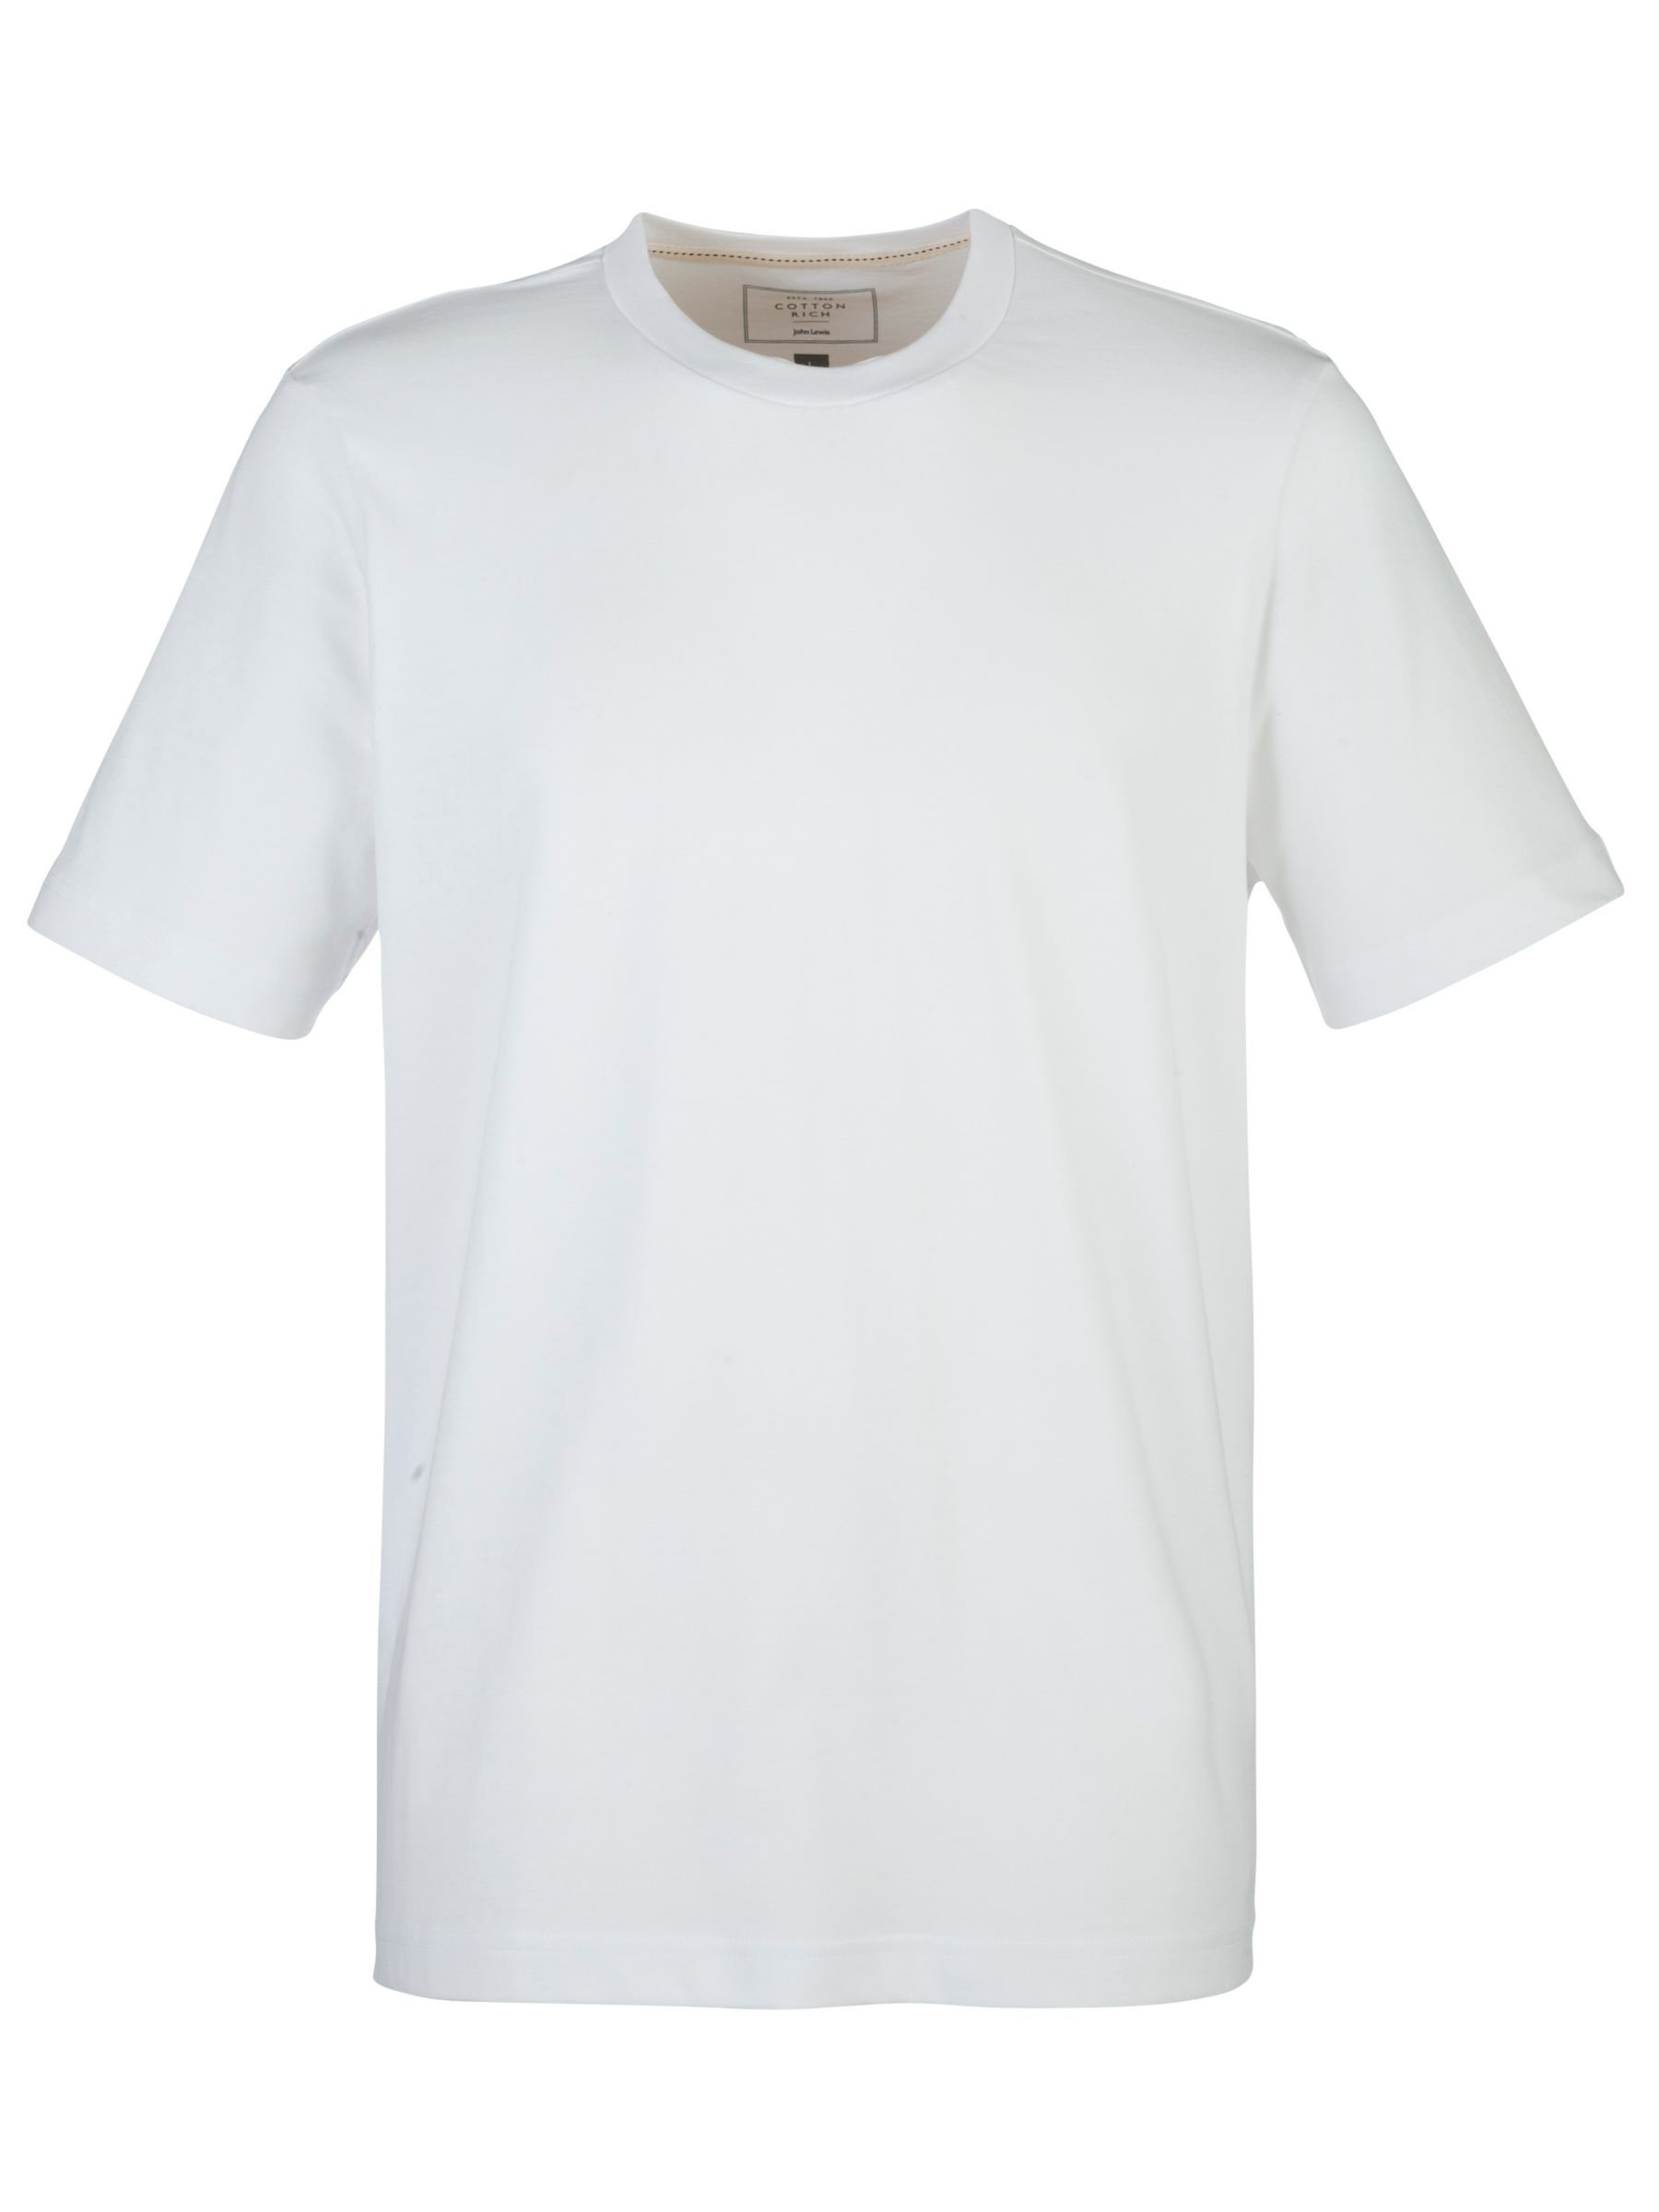 John Lewis Crew Neck Short Sleeve Lounge T-Shirt, White